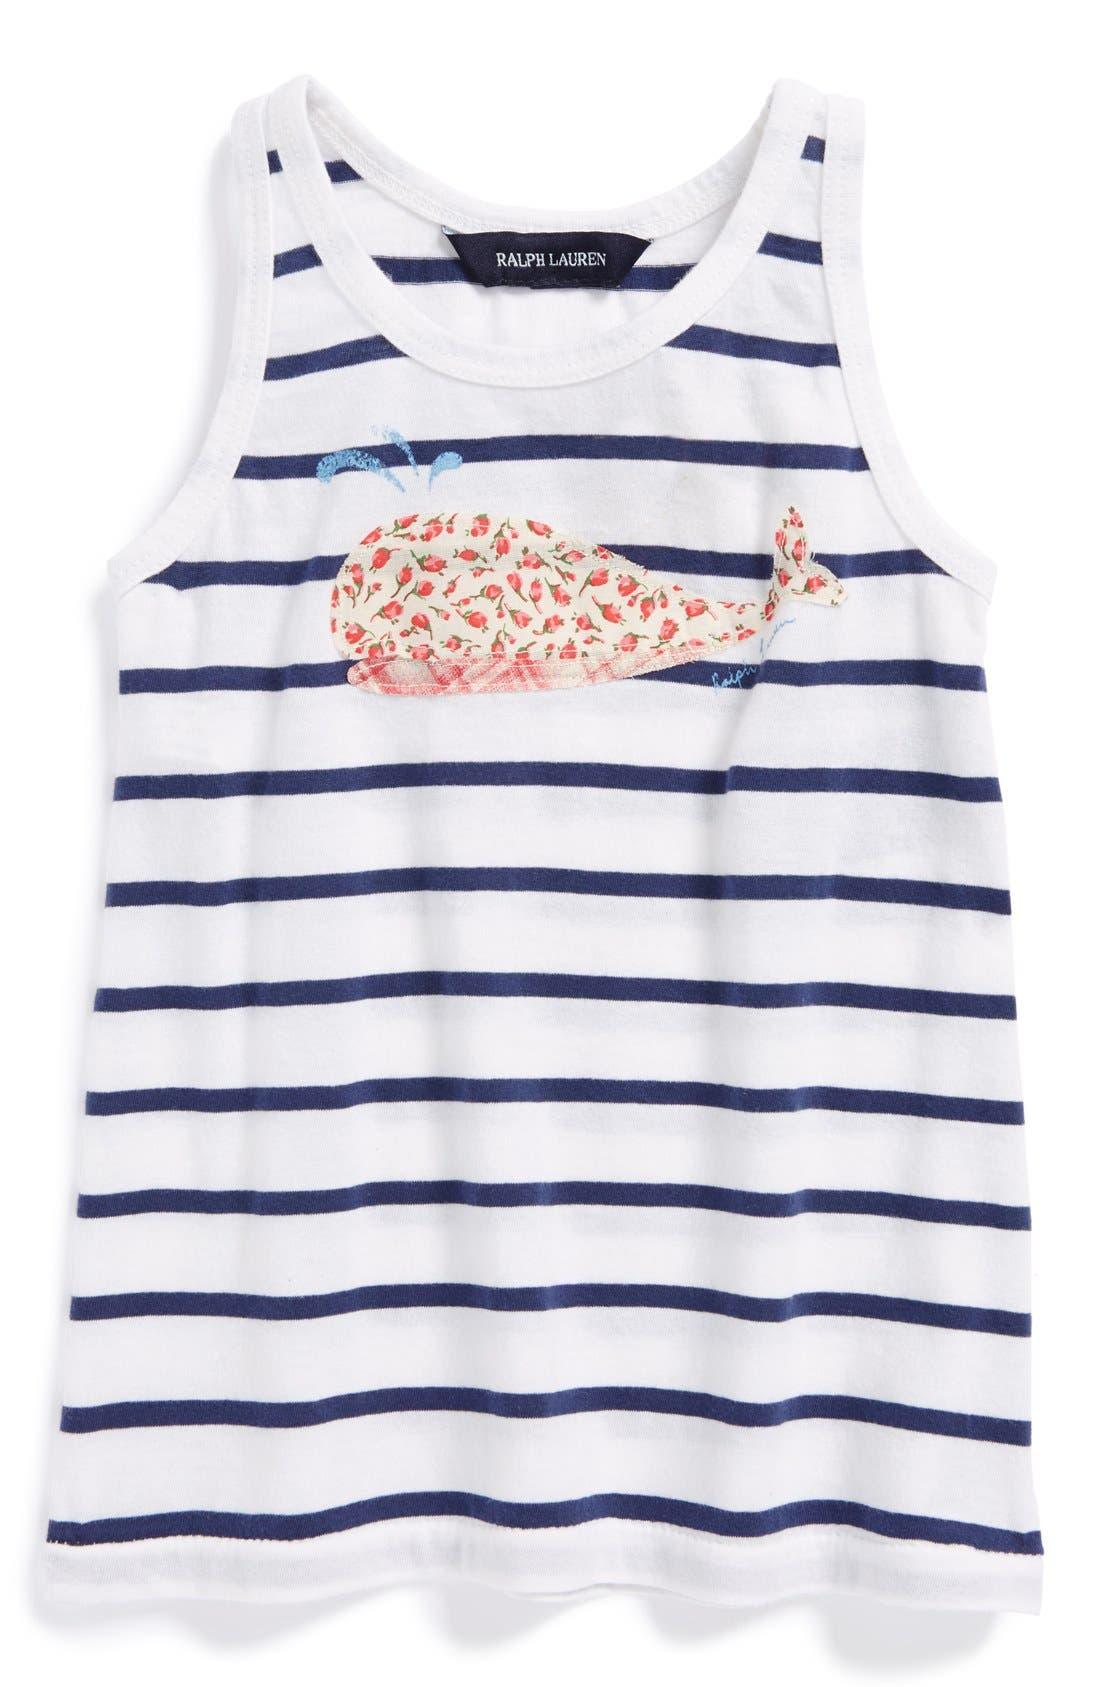 Alternate Image 1 Selected - Ralph Lauren Appliqué Logo Jersey Tank Top (Toddler Girls)